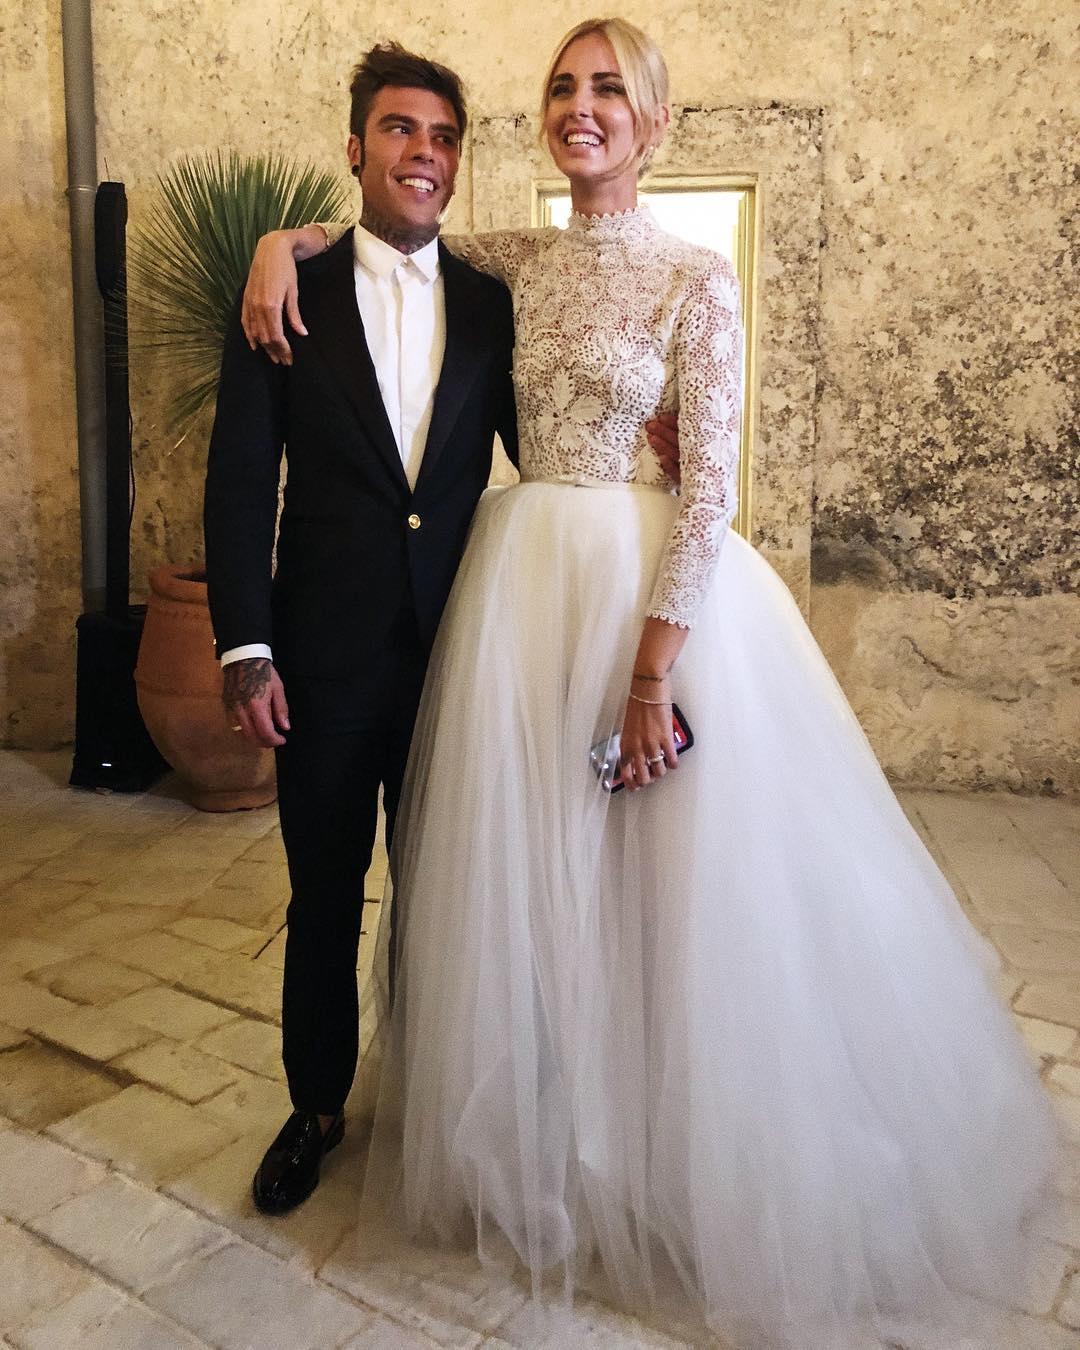 44cc31f7a8 όλες τις λεπτομέρειες και συνεχή updates για τον γάμο της Chiara Ferragni!  chiara ferragni dior the ferragnez νυφικό